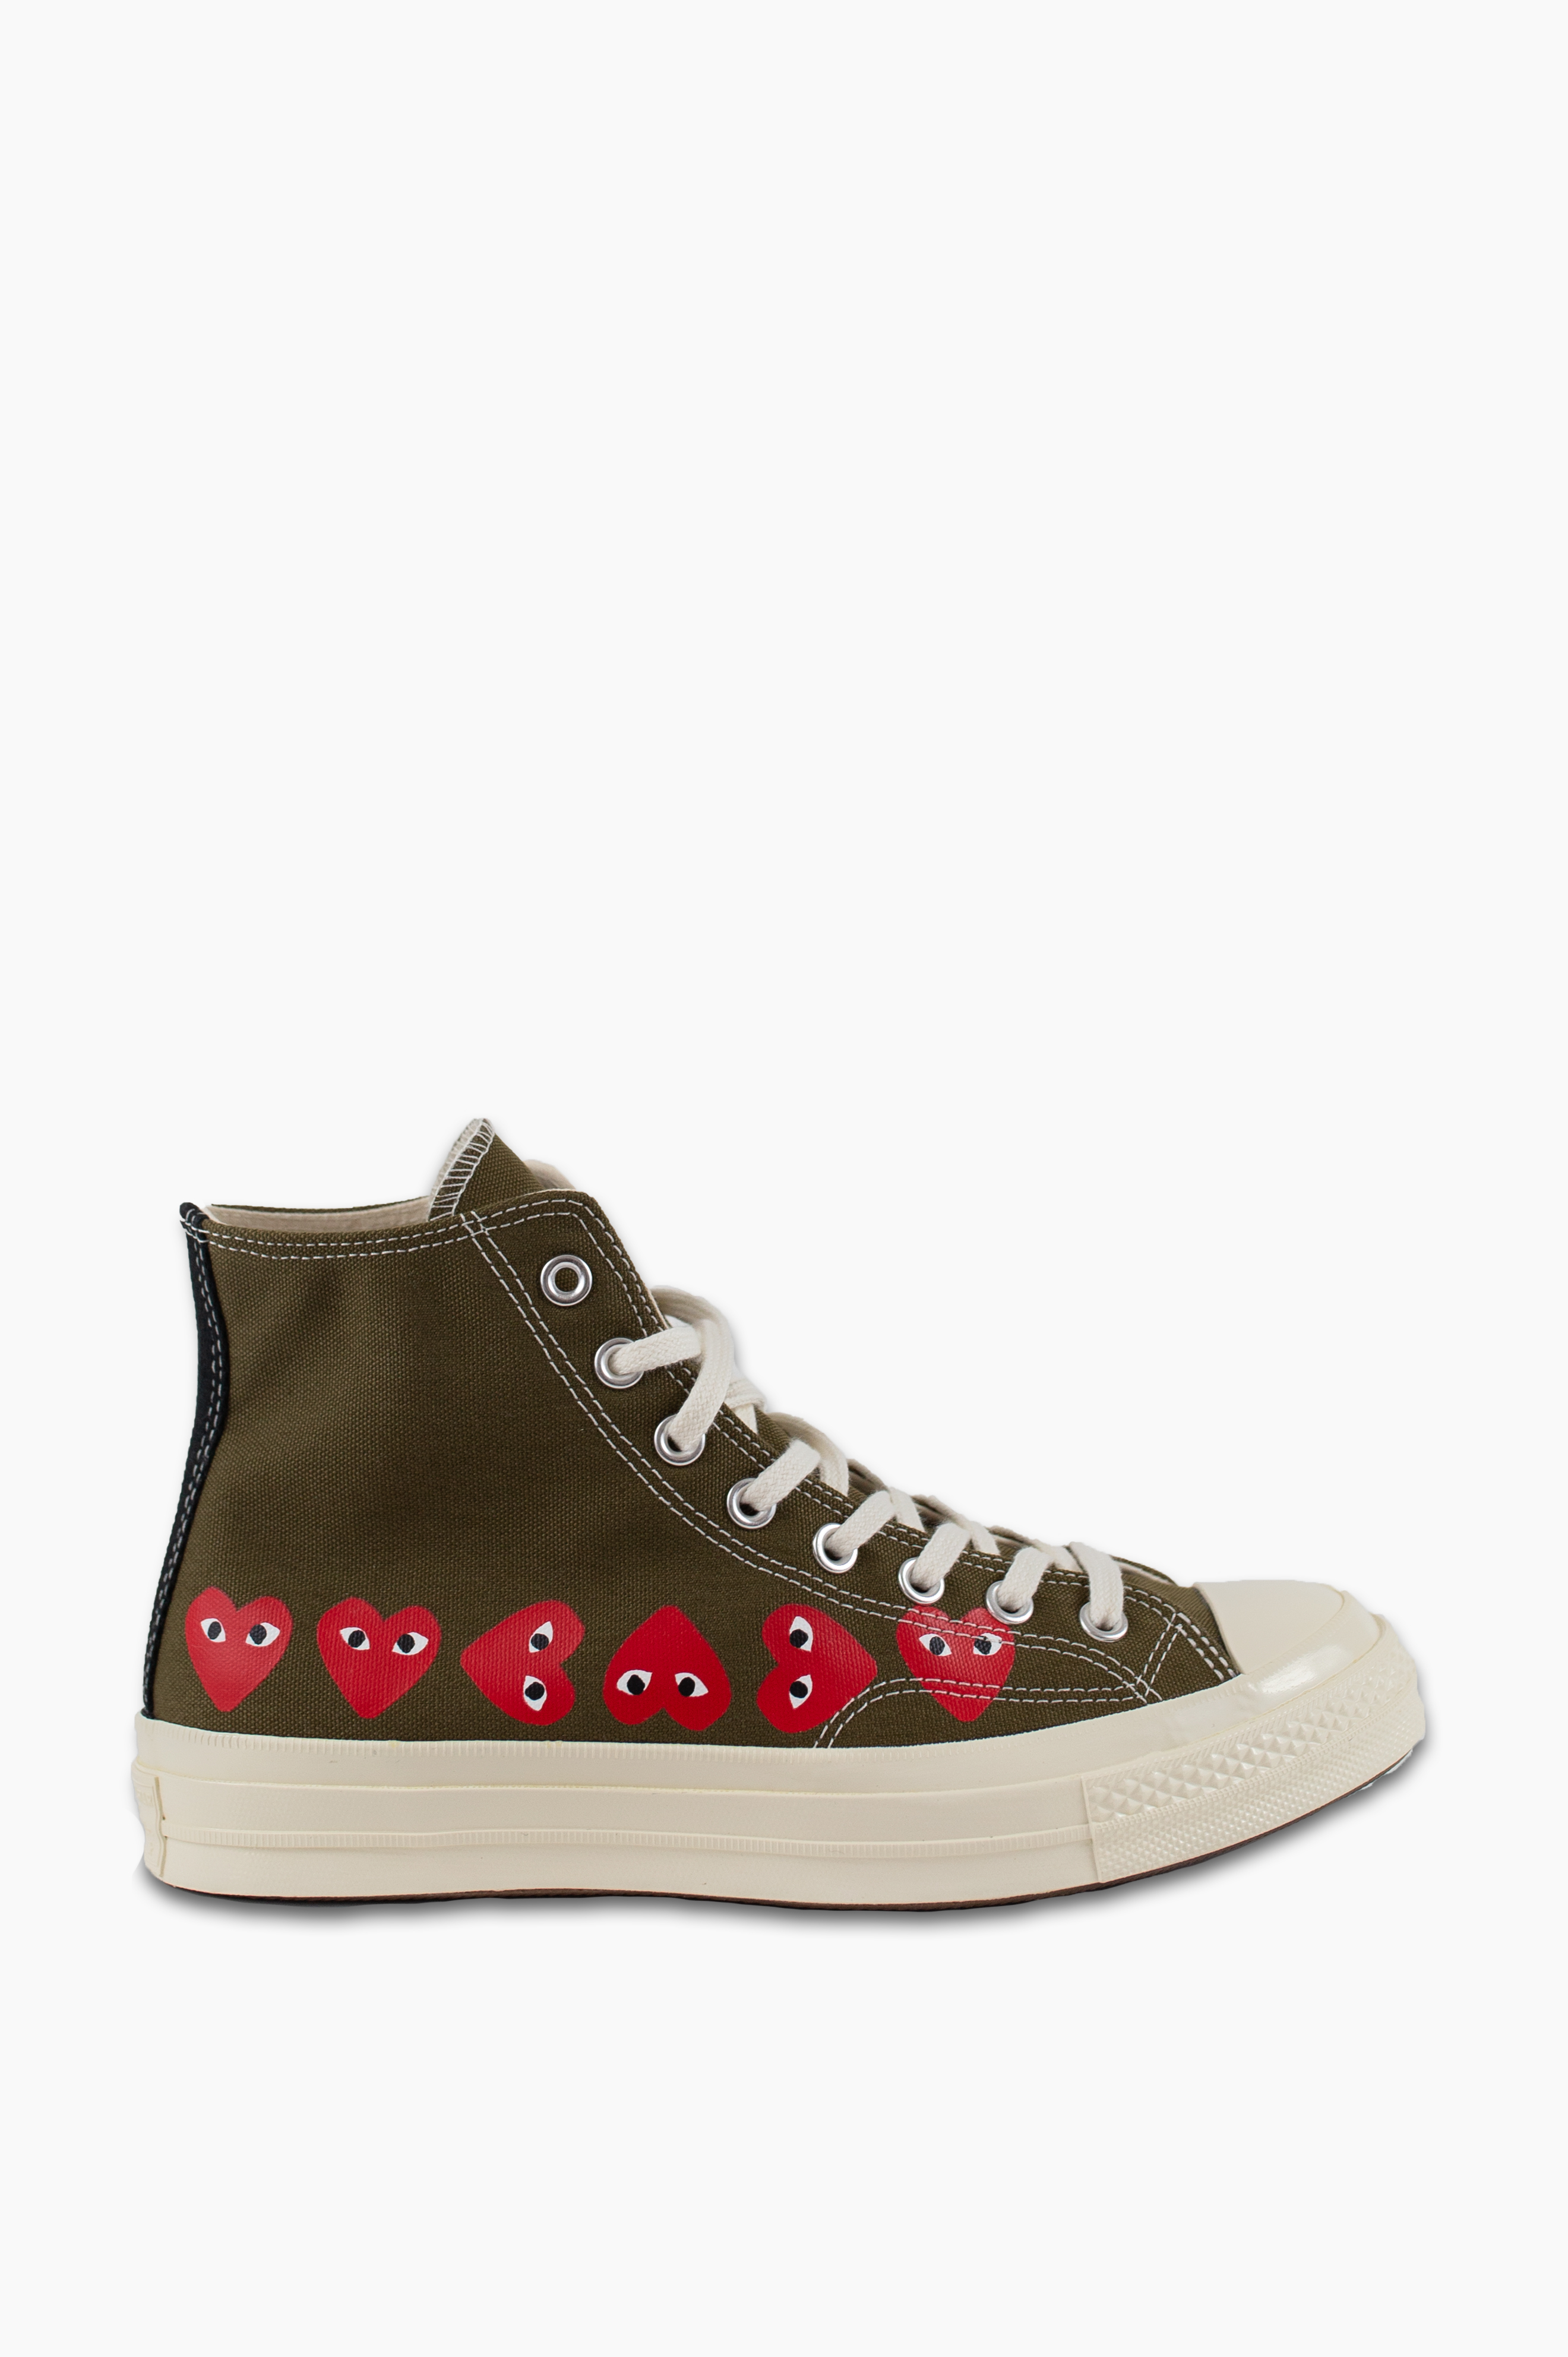 Converse Chuck Taylor All Star '70 High Khaki Multy Heart